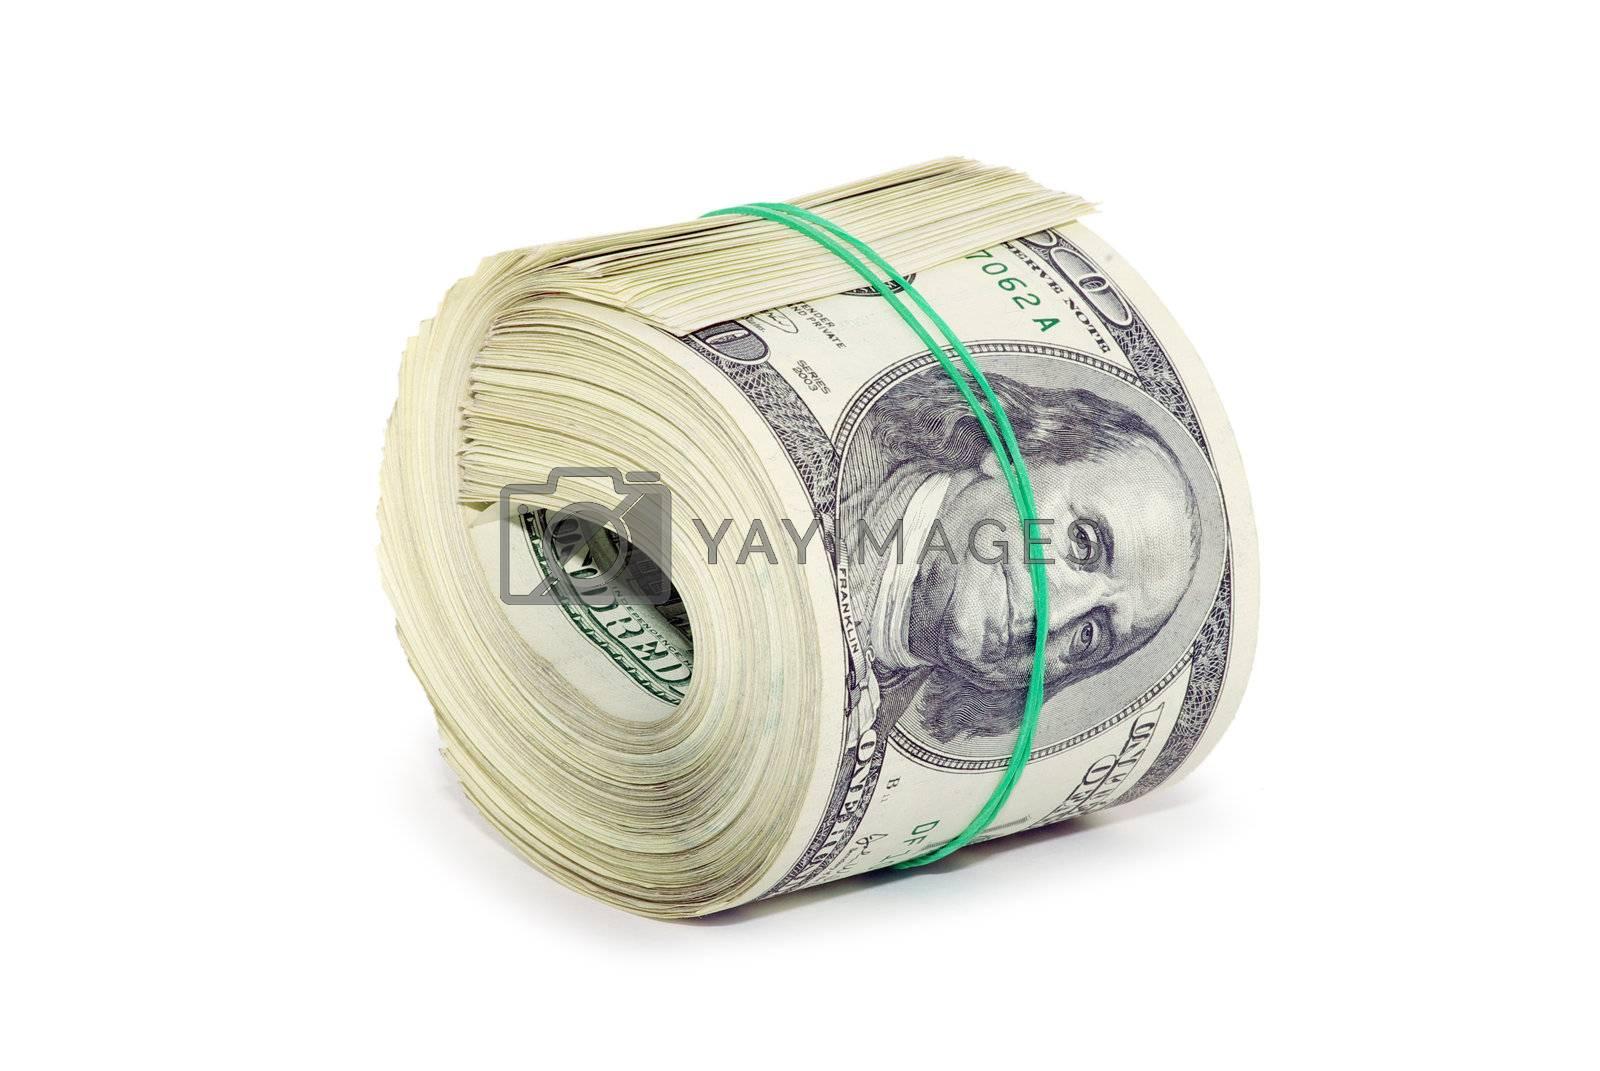 lot of money isolated on white background